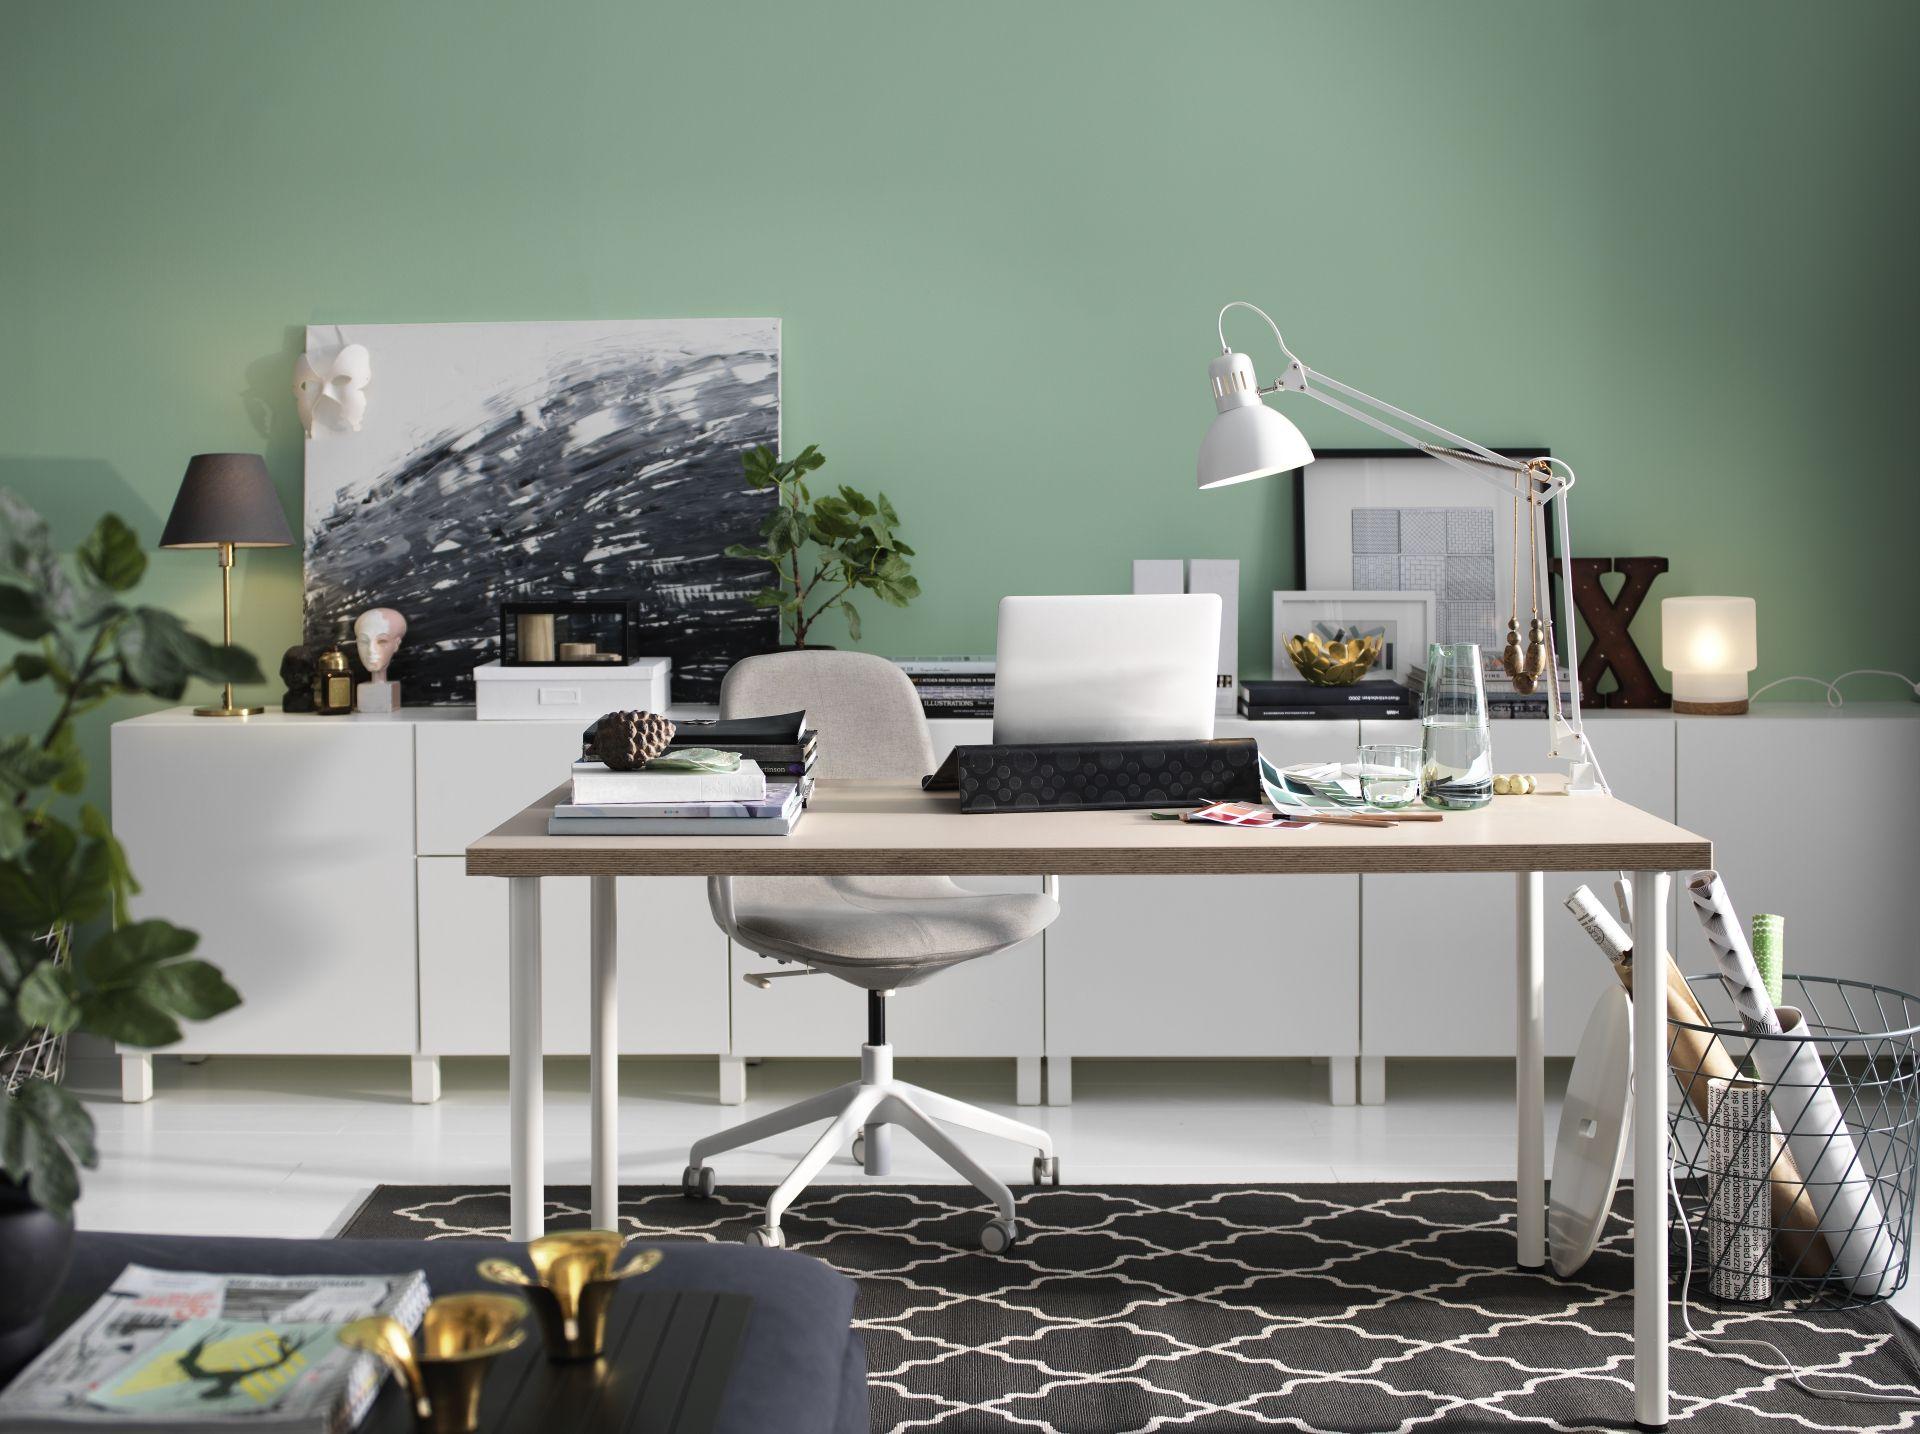 LÅngfjÄll bureaustoel ikea ikeanl ikeanederland stoel werkplek